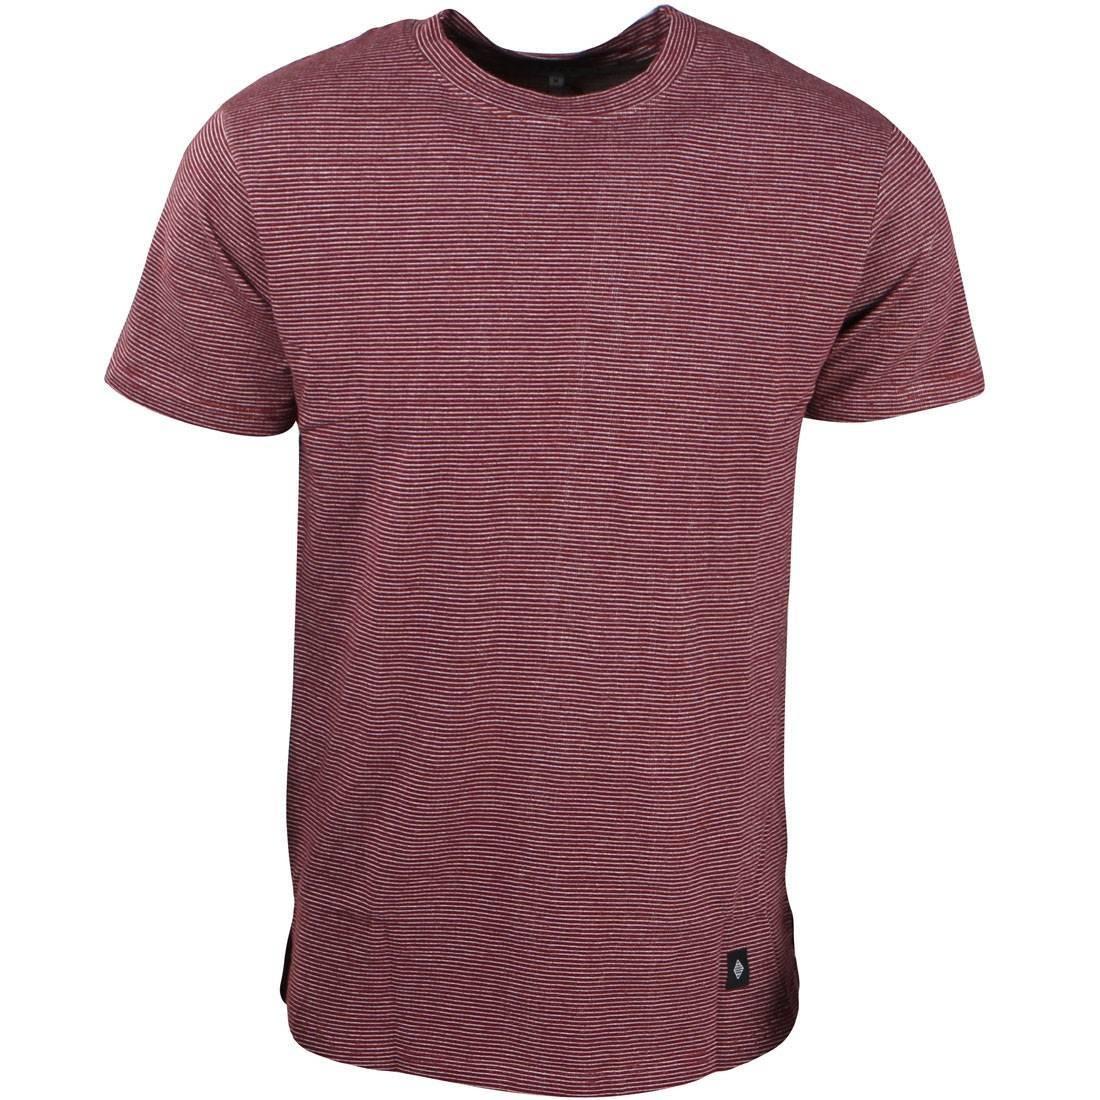 Tシャツ 赤 レッド 【 RED AKOMPLICE MEN TODAY TEE 】 メンズファッション トップス Tシャツ カットソー